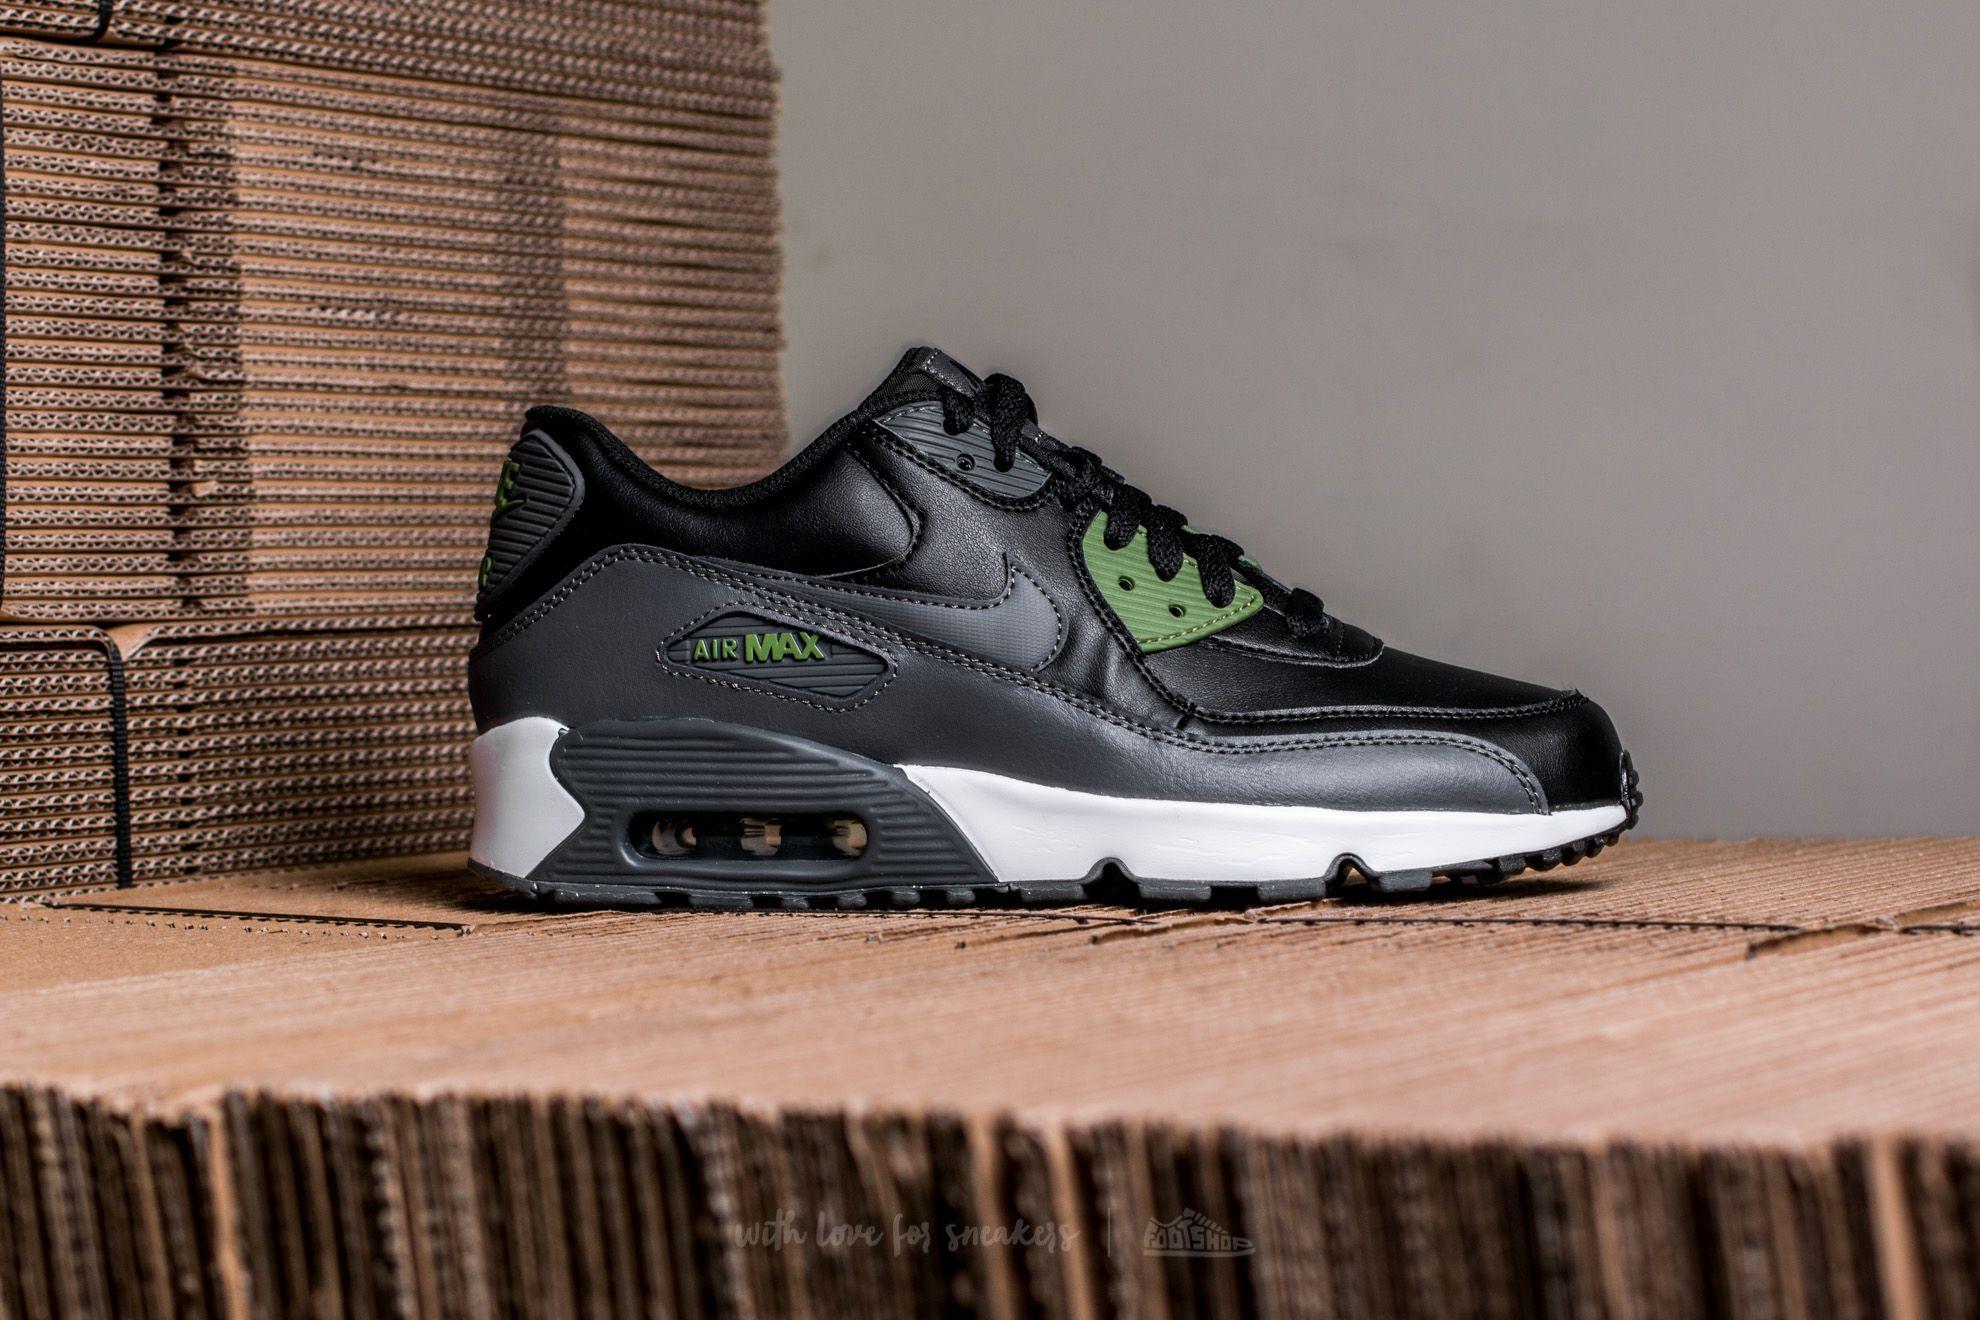 Nike NIKE AIR MAX 90 MESH (GS) BlackDark Grey Palm Green